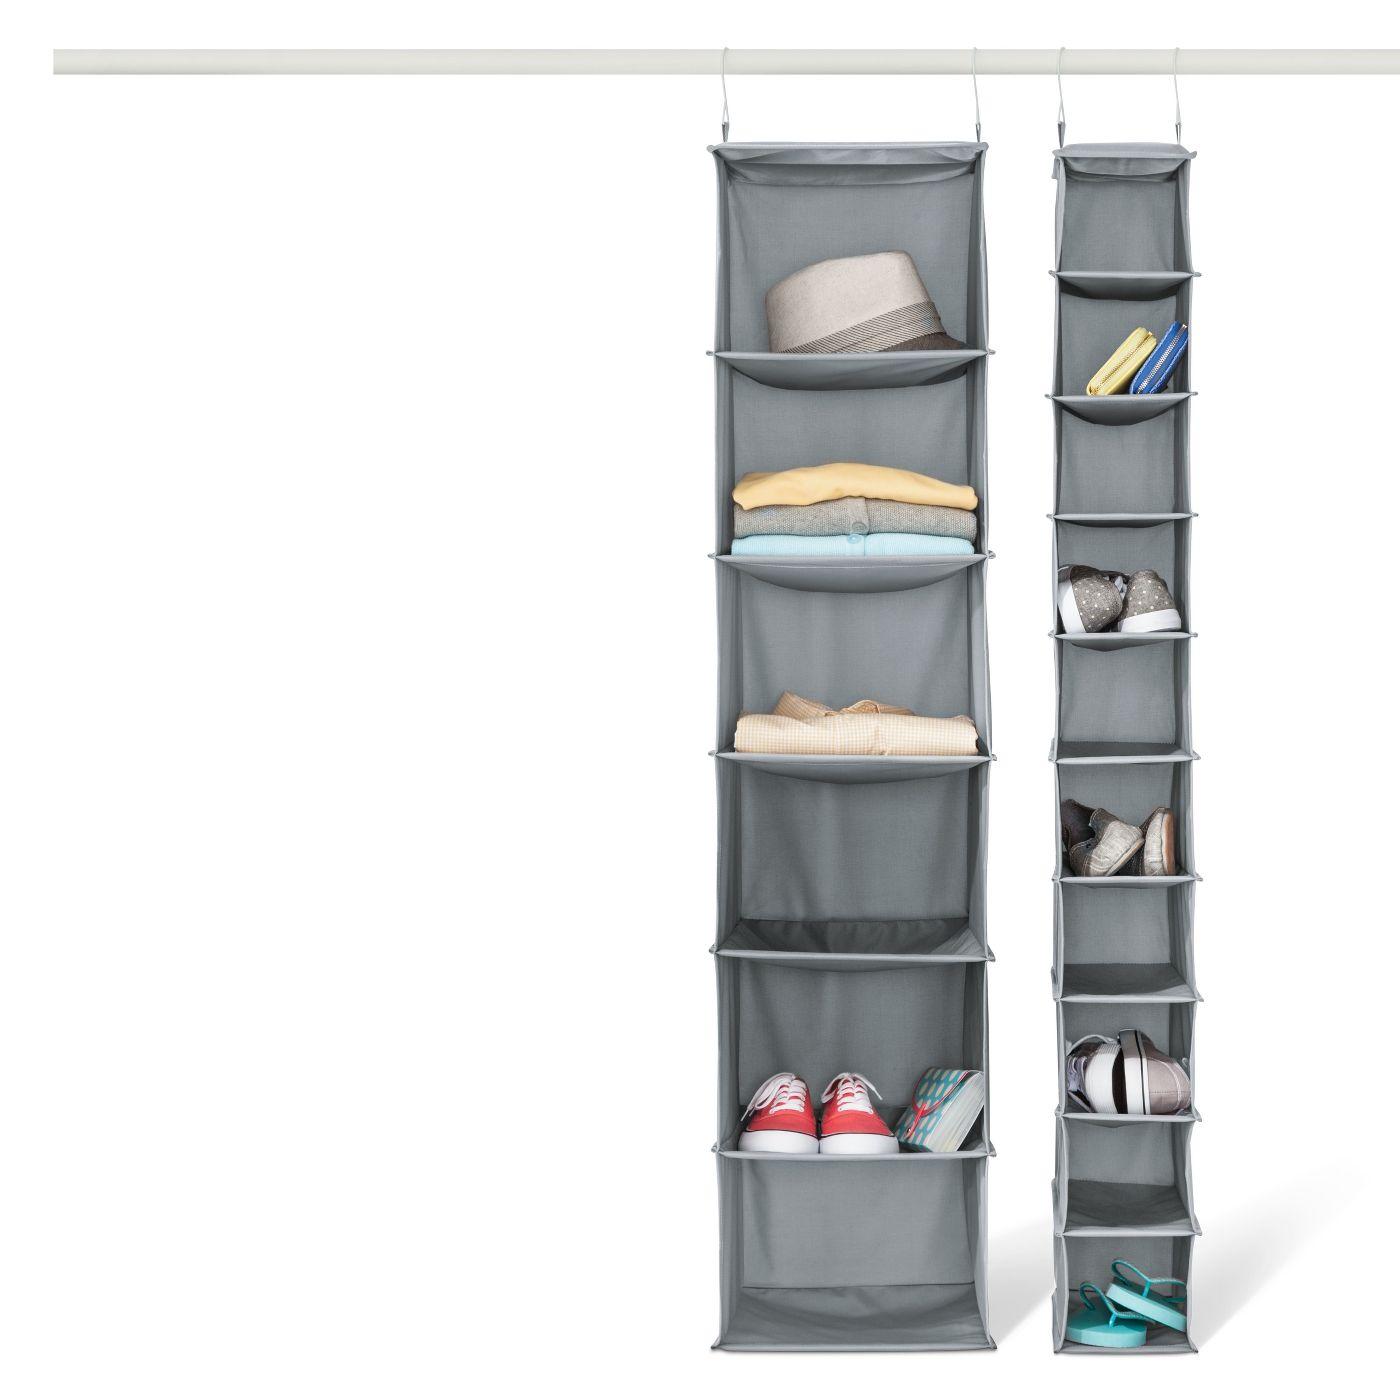 10-Shelf Hanging Shoe Storage Organizer – Gray - Room Essentials™ - image 2 of 2